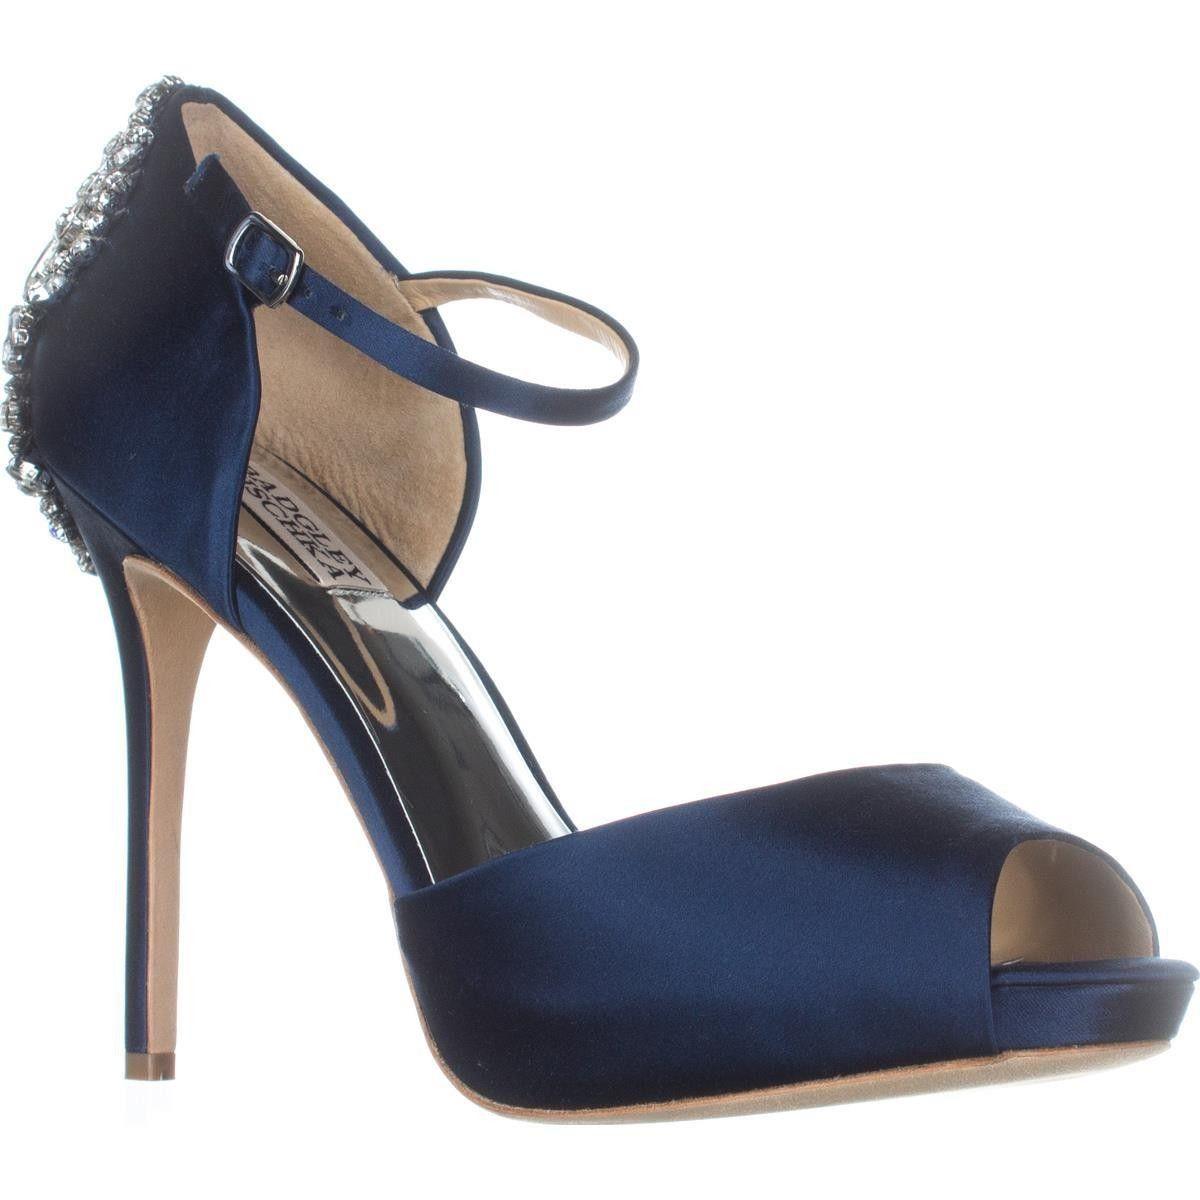 19bcbfb10c4ab Badgley Mischka Dawn Mary Jane Dress Sandals